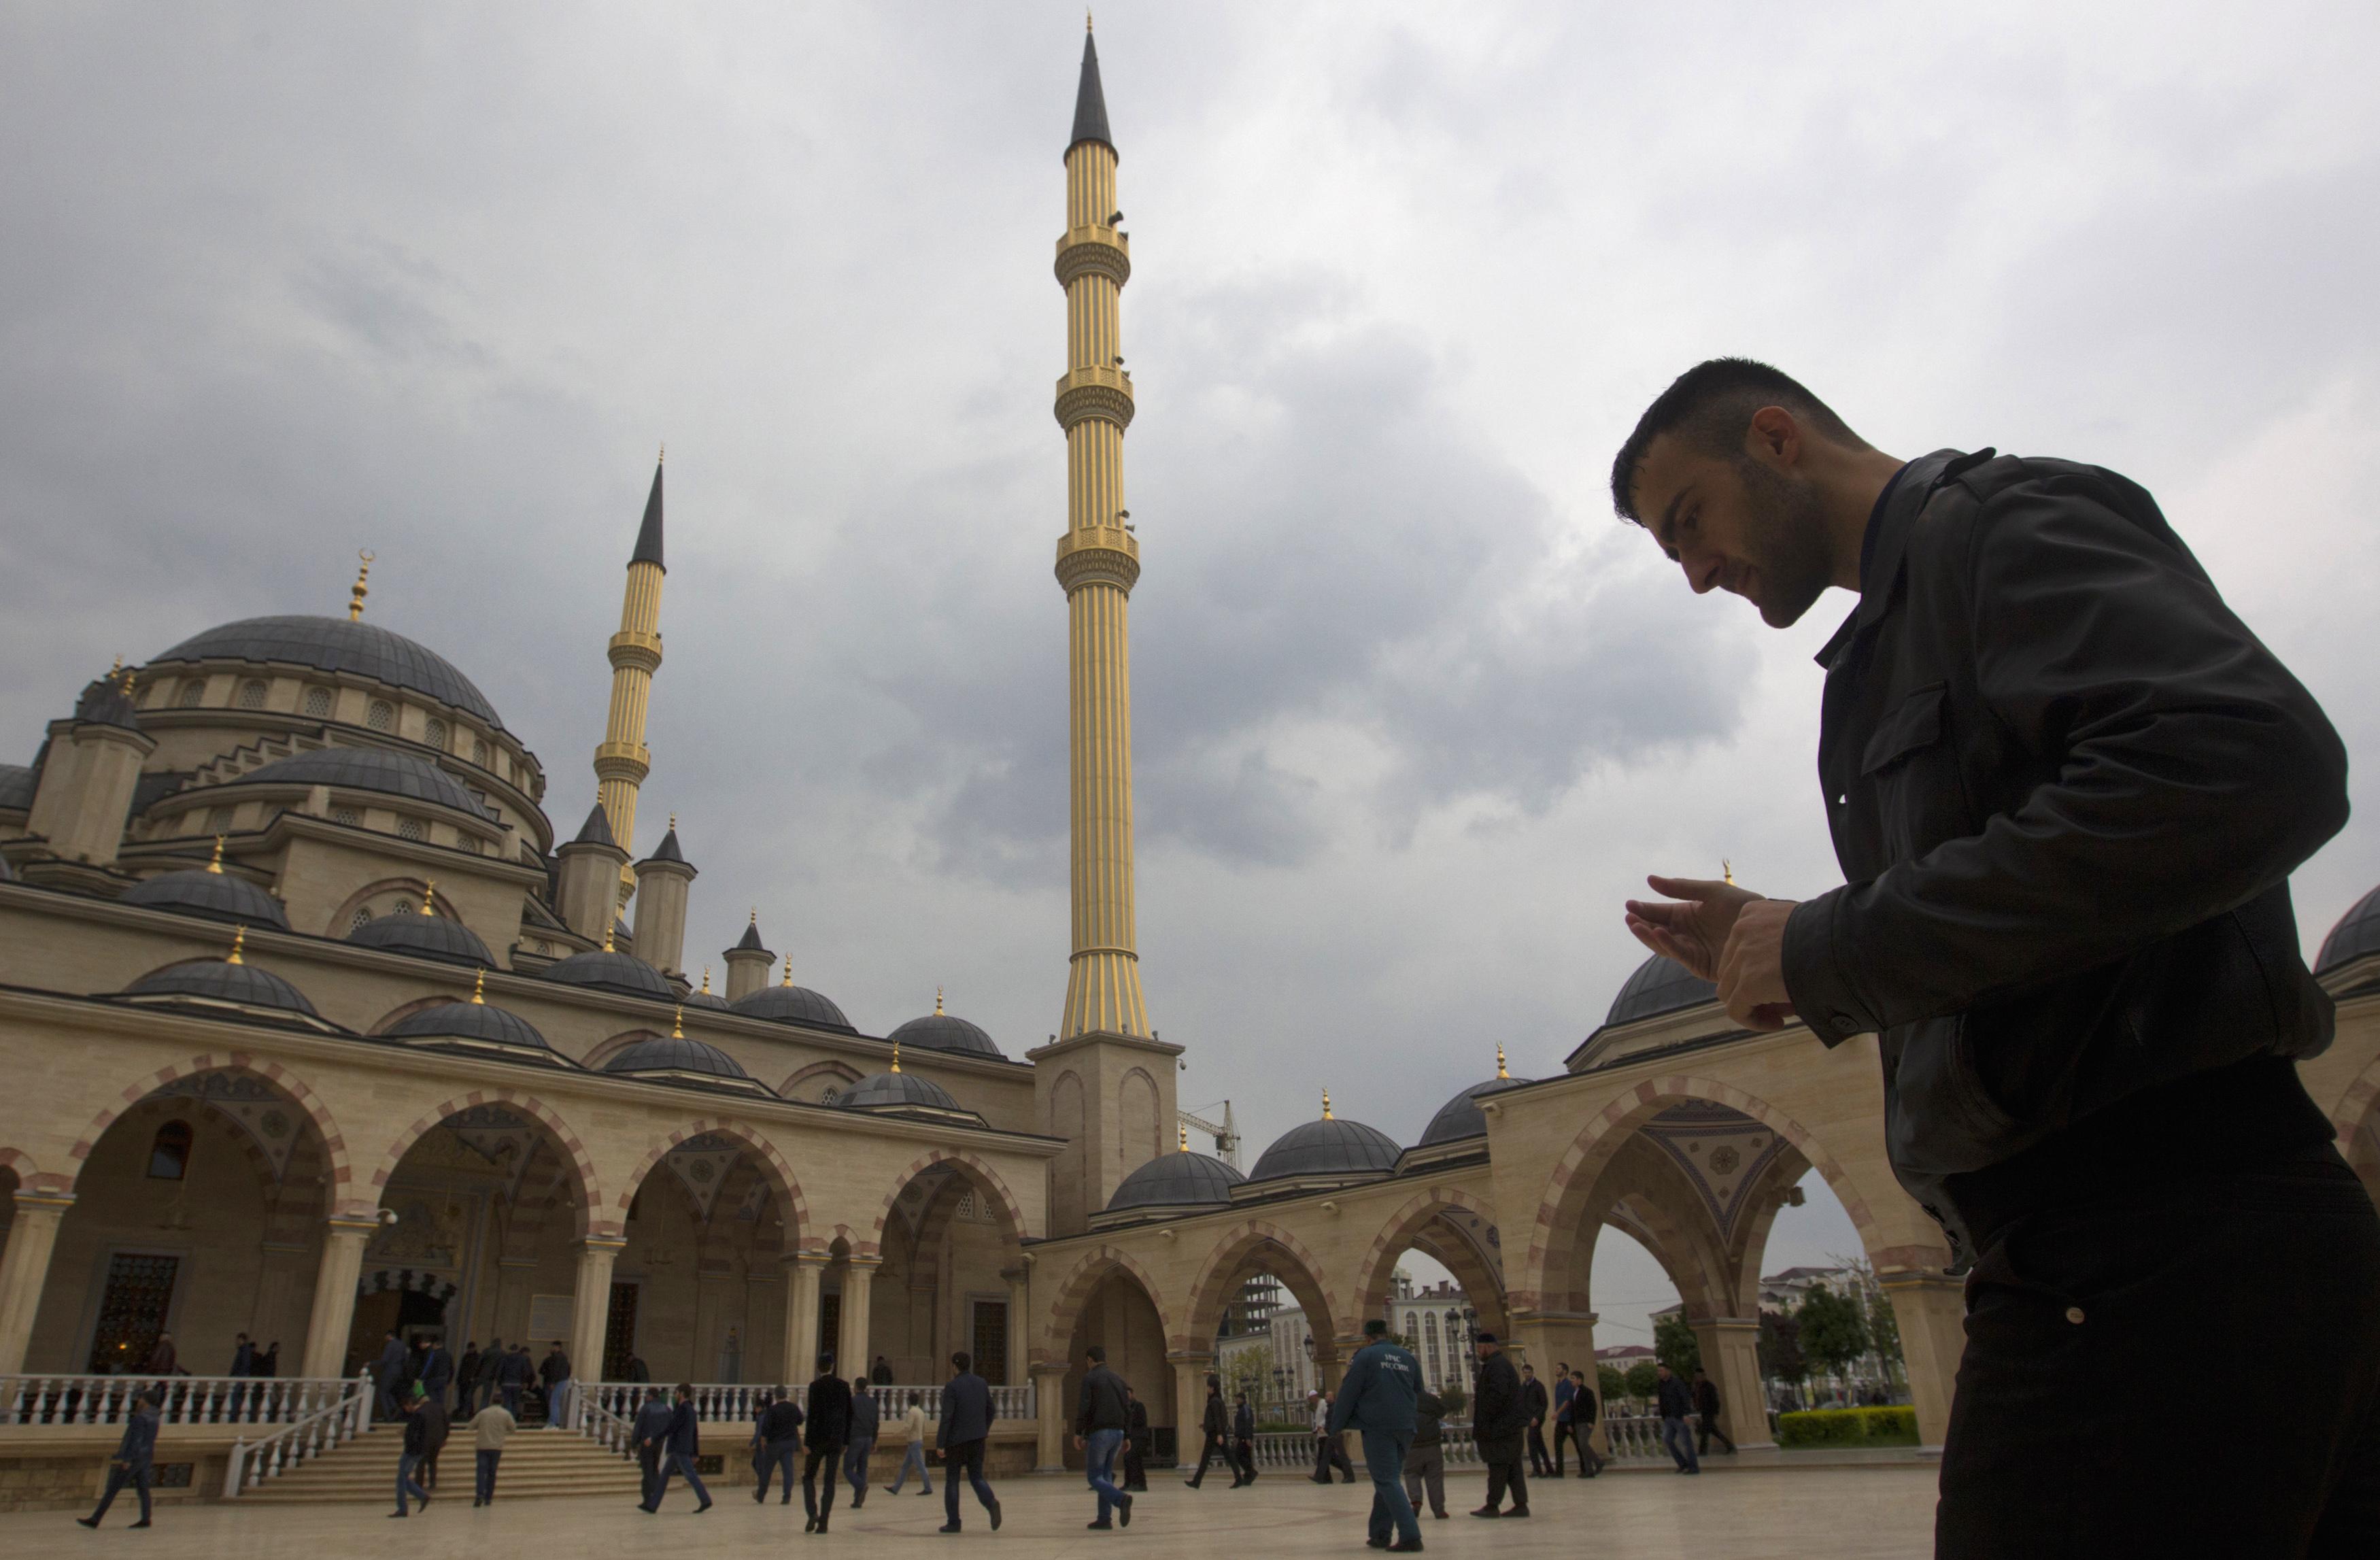 Masjid Jantung Chechnya, yang diberi nama dari nama presiden pertama Republik Chechnya, Akhmat Kadyrov, dibangun dengan gaya Turki. Sekilas, masjid ini tampak menyerupai Masjid Biru di Istanbul. Masjid ini juga memiliki kamera yang dipasang di luar masjid dan disiarkan setiap saat.